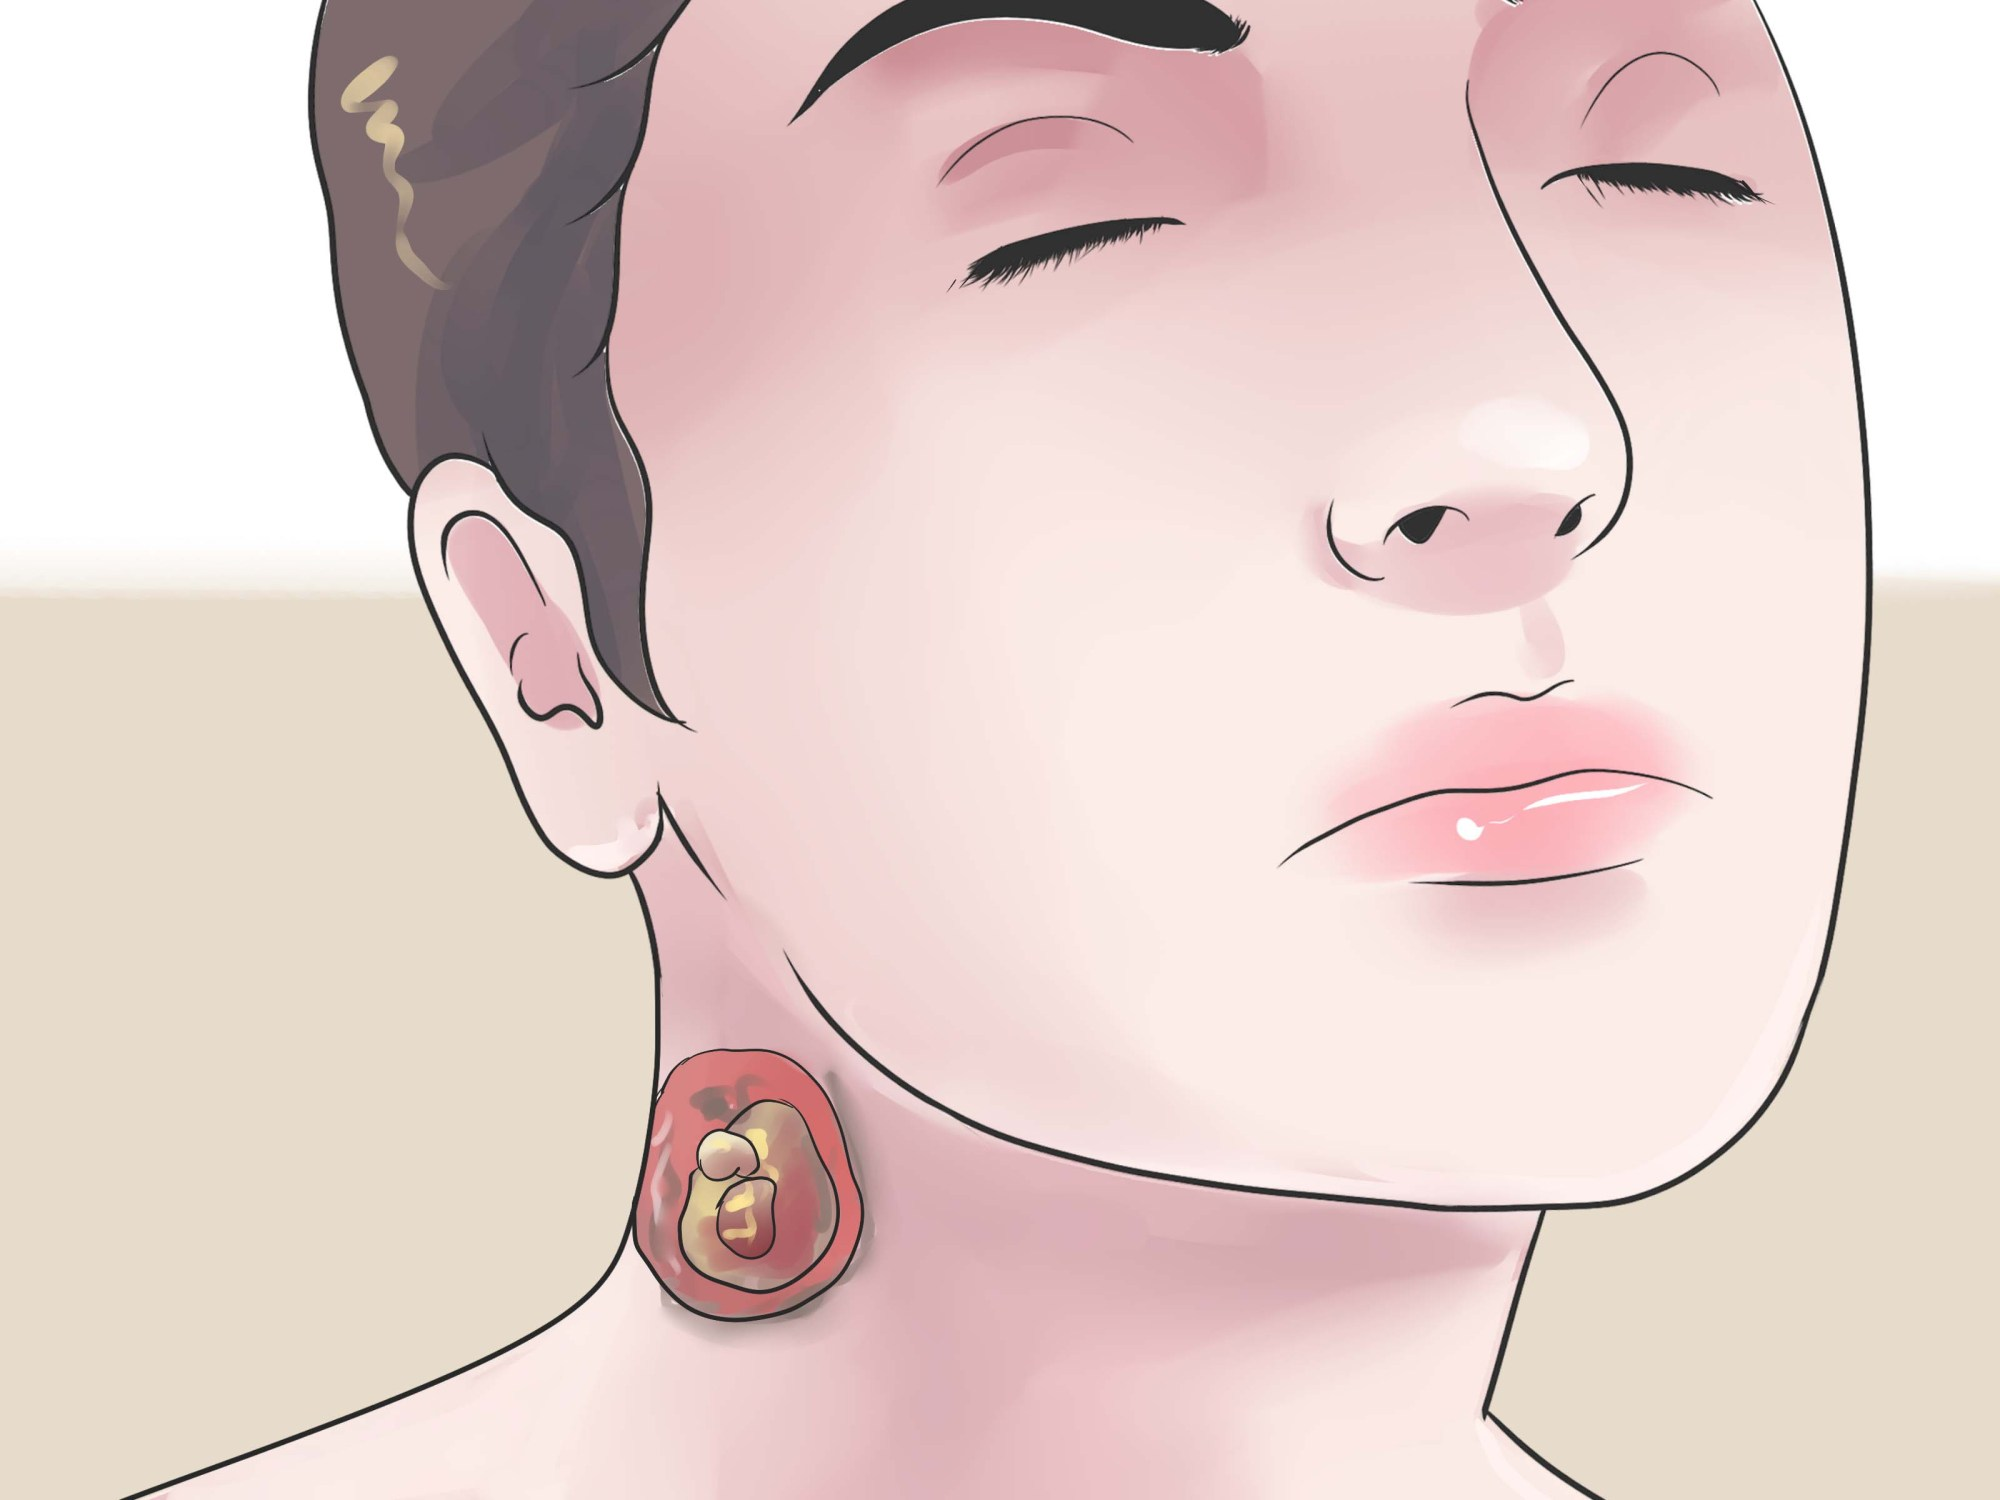 hight resolution of cyst on earlobe diagram